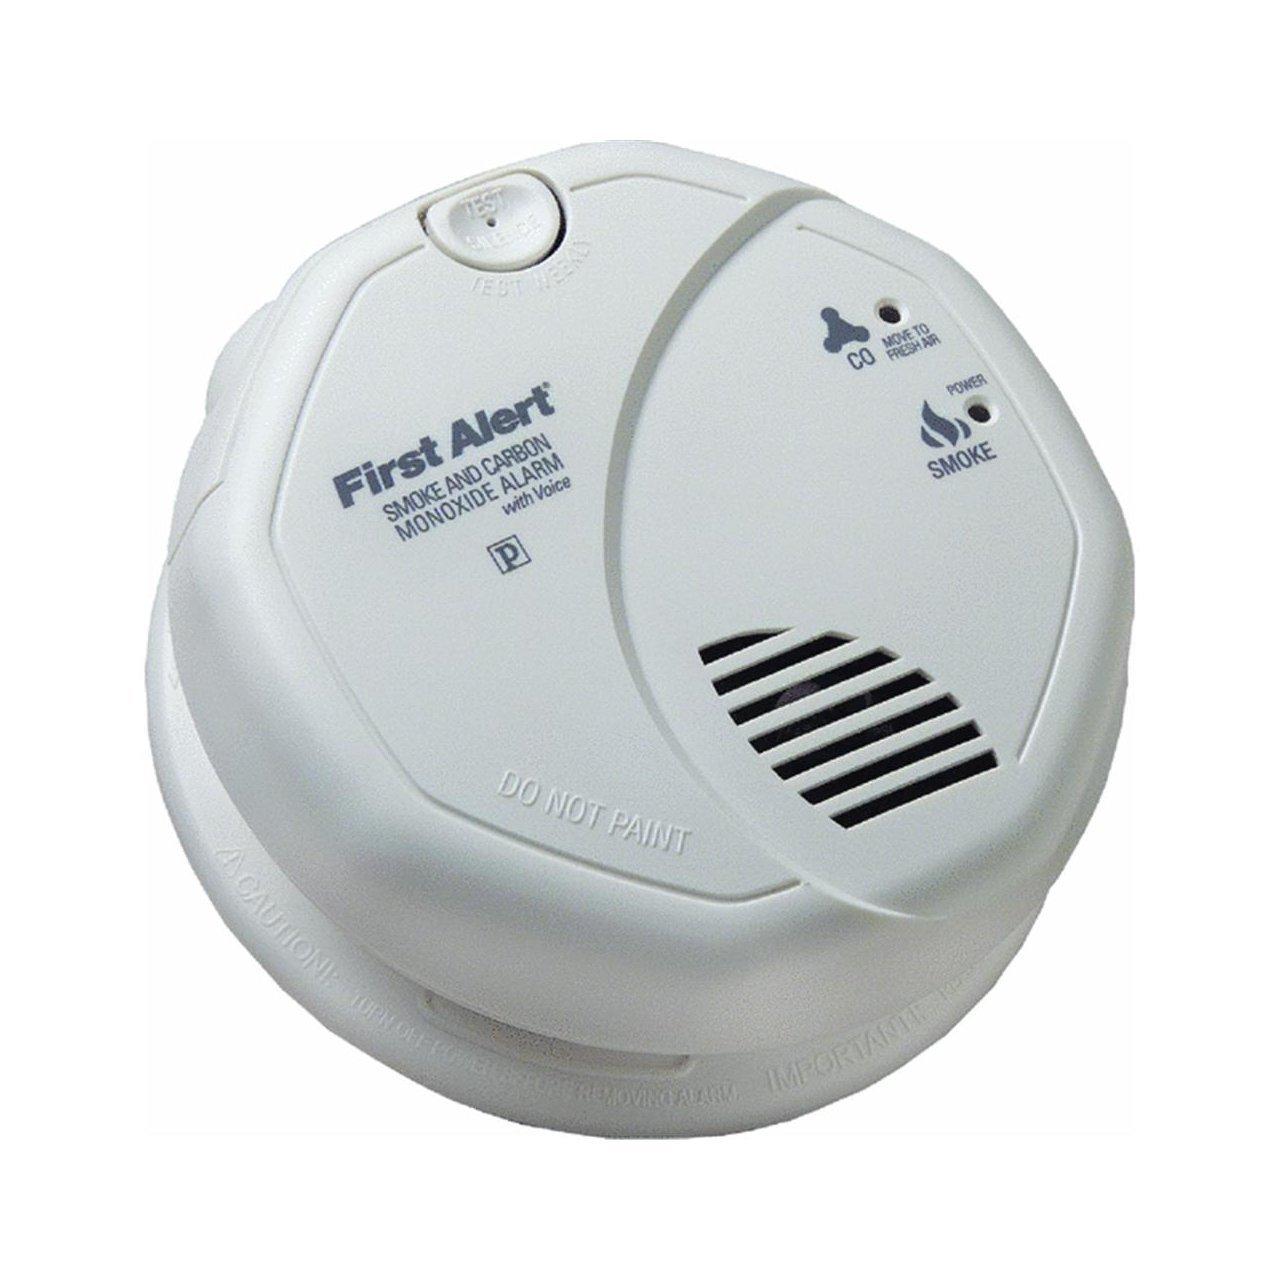 First Alert BRK SC7010BV Hardwired Talking Photoelectric Smoke and Carbon Monoxide Alarm  2 Pack